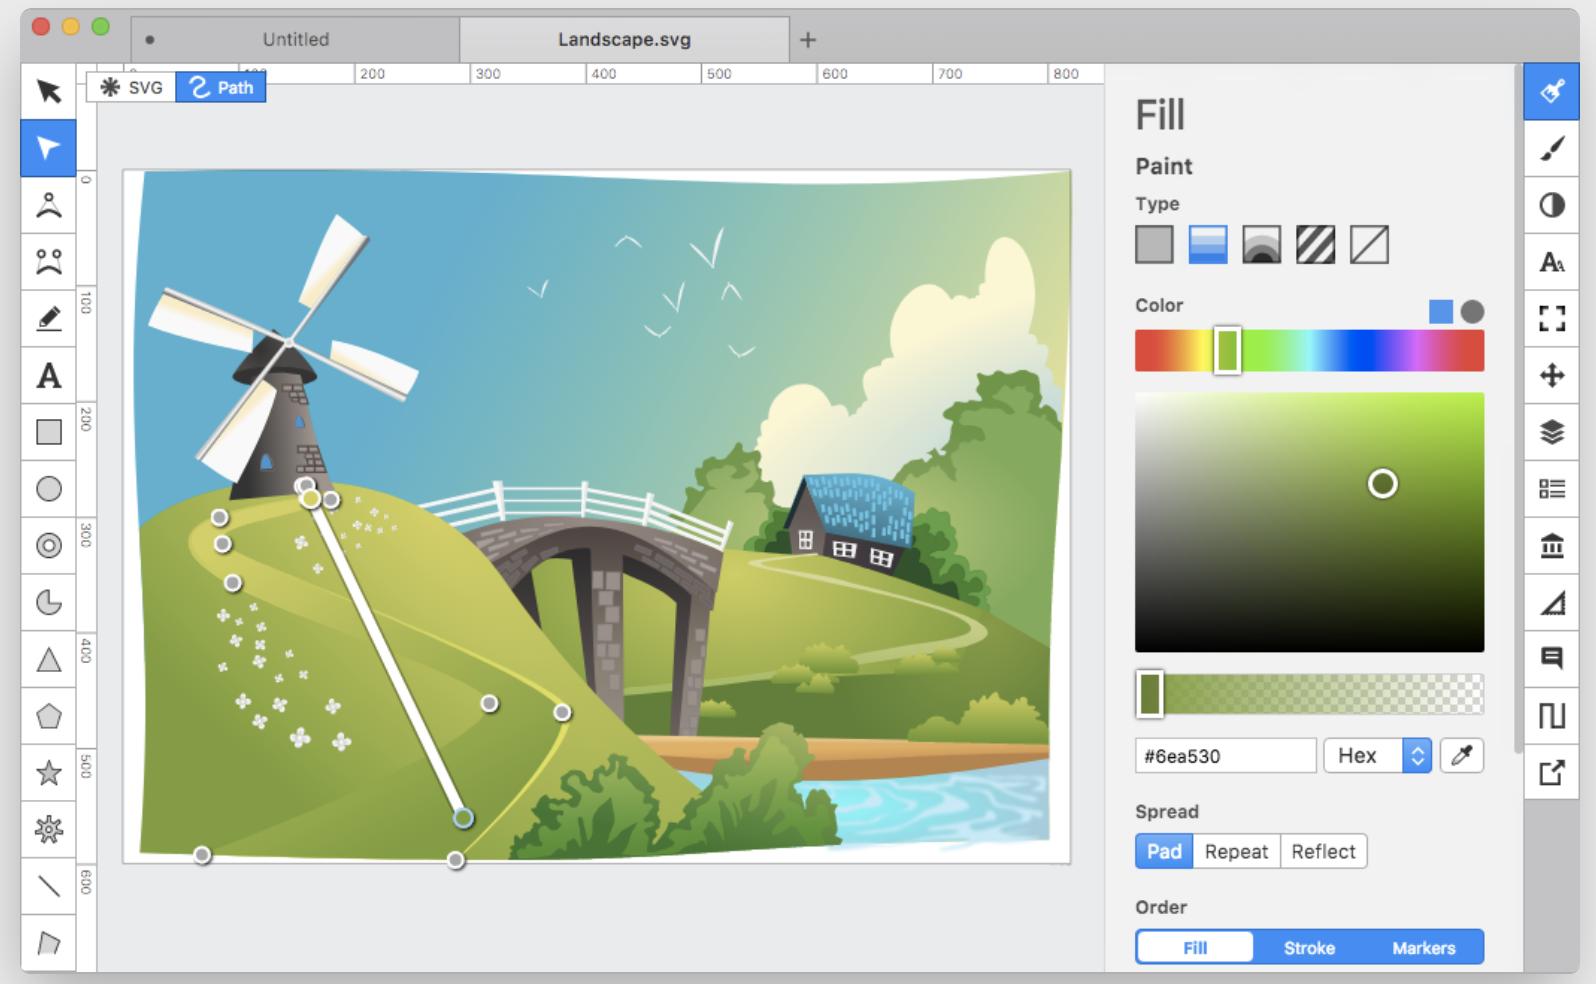 Adobe Illustratoresk Program Thats Free For Mac